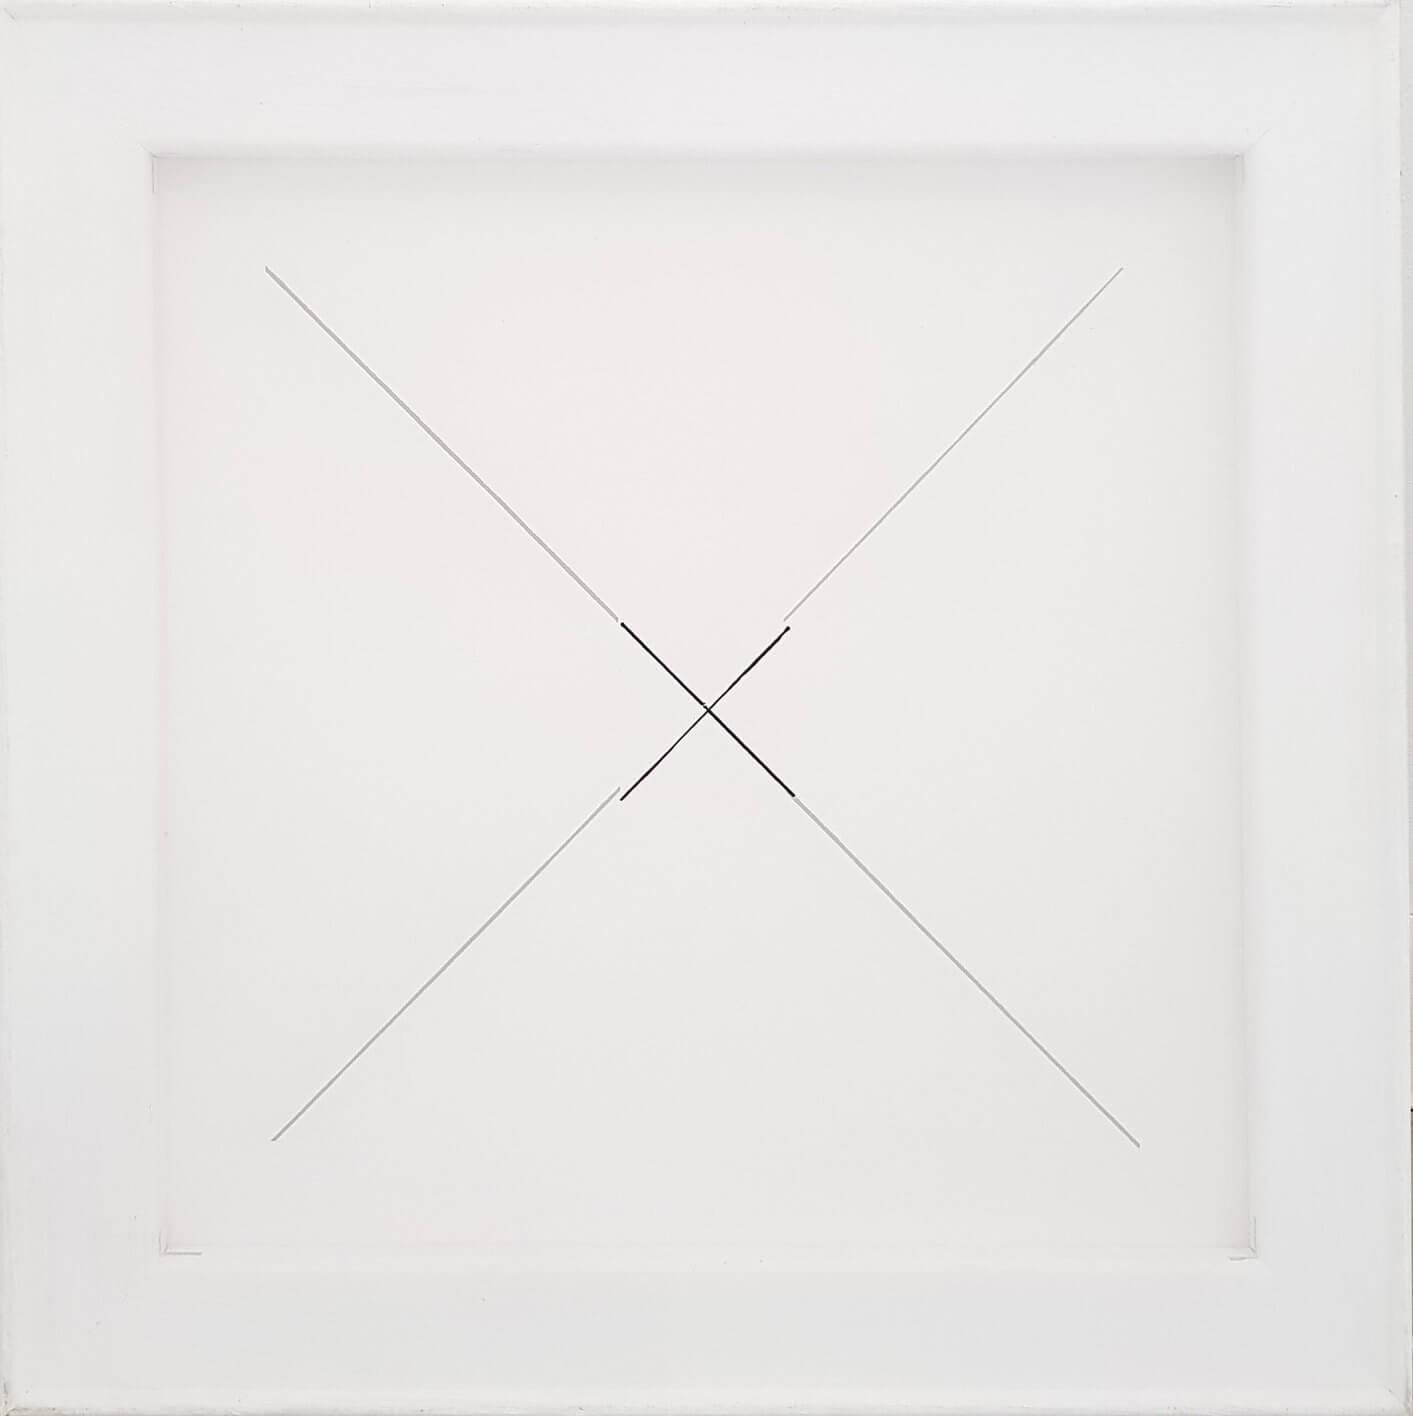 1577_Benni Efrat, Untitled, 2018, Mixed media on canvas, 40x40 cm (2)-1413x1416 (1)